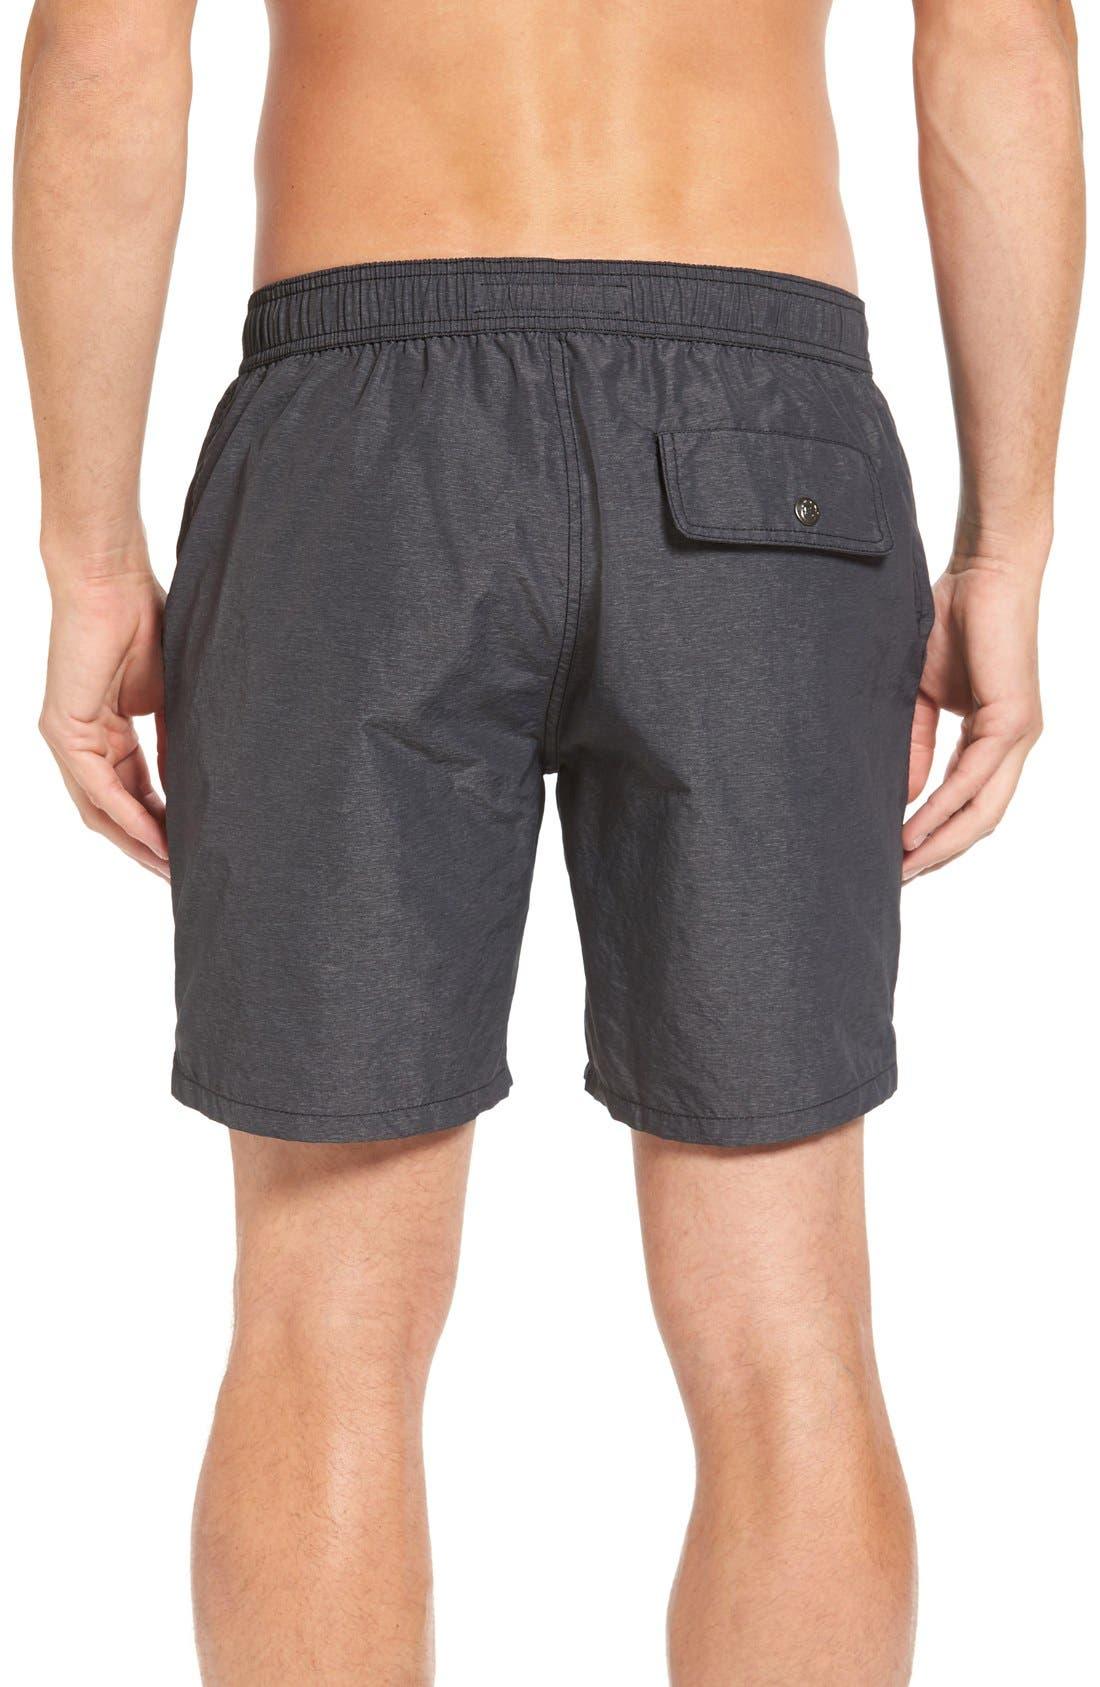 Hybrid Shorts,                             Alternate thumbnail 2, color,                             001